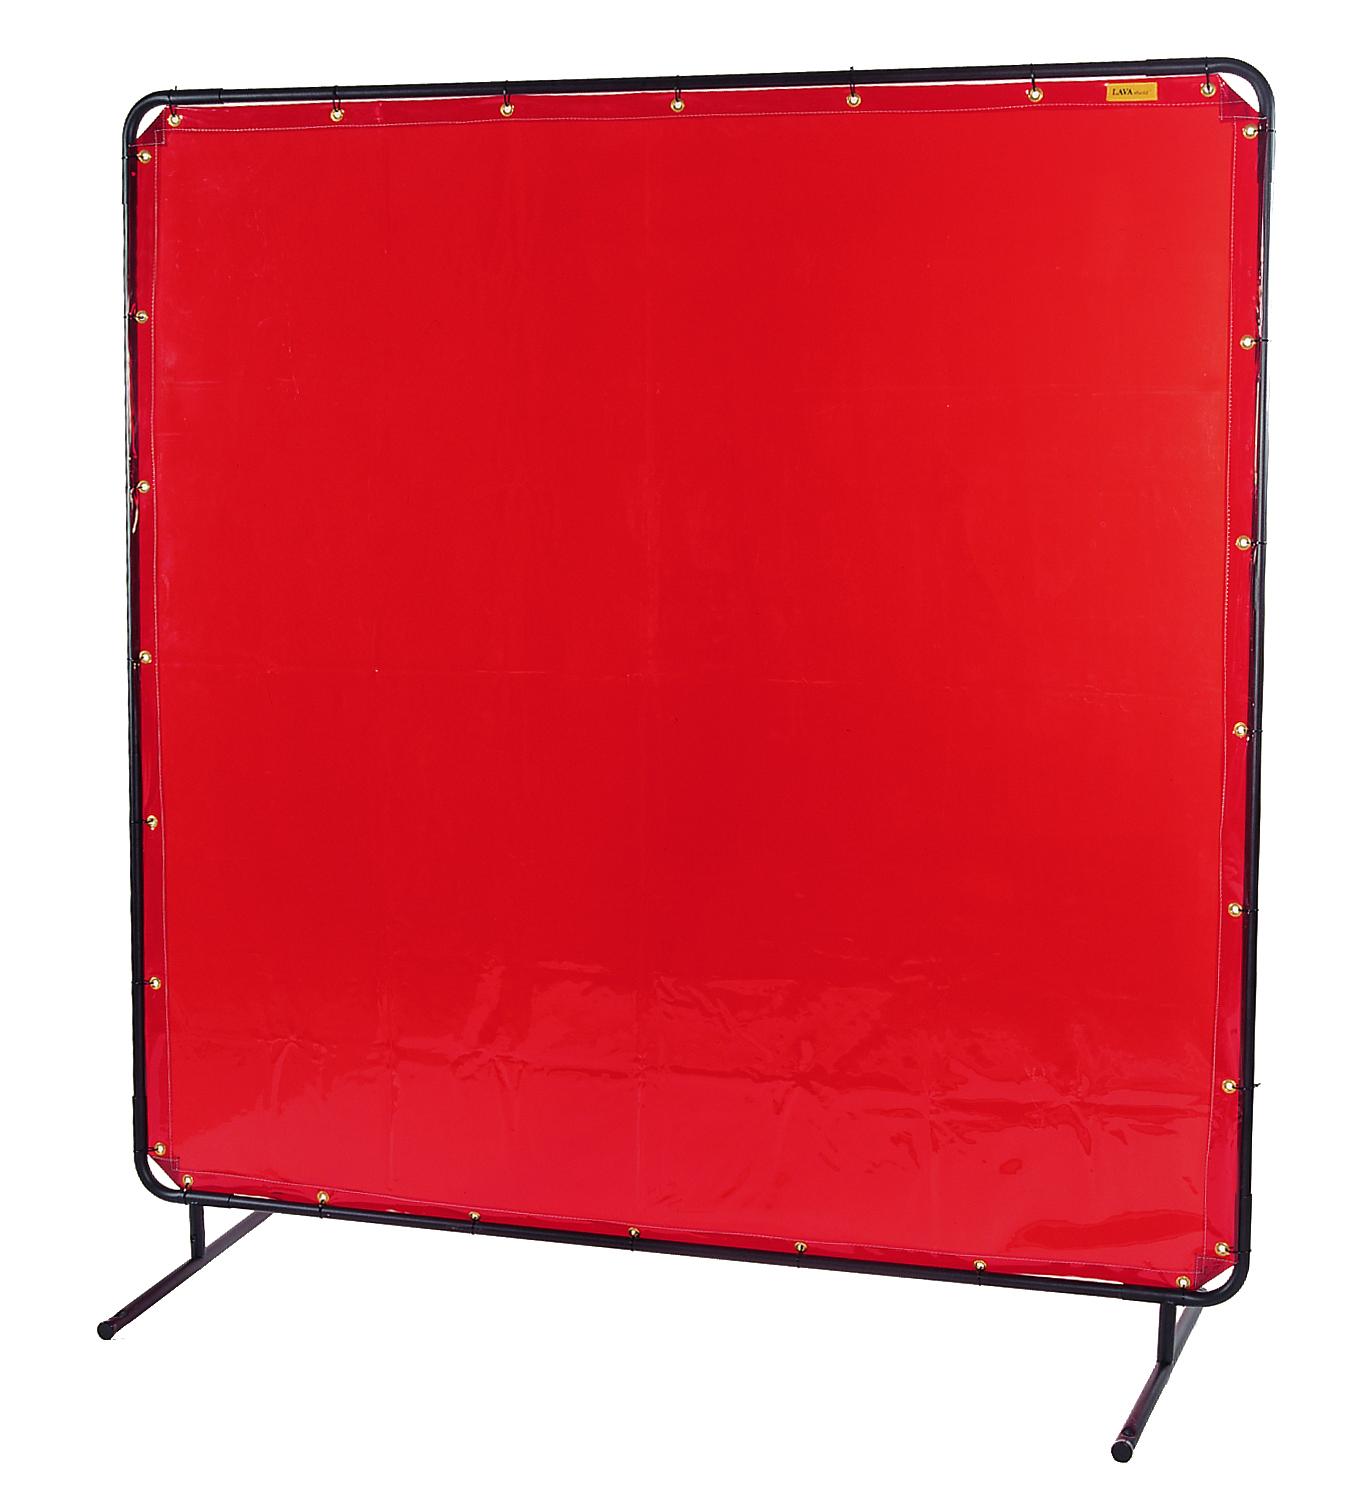 55-8668 Ramă modulară COMBOframe™ 1,8 x 1,8 m sau 1,8 x 2,4 m